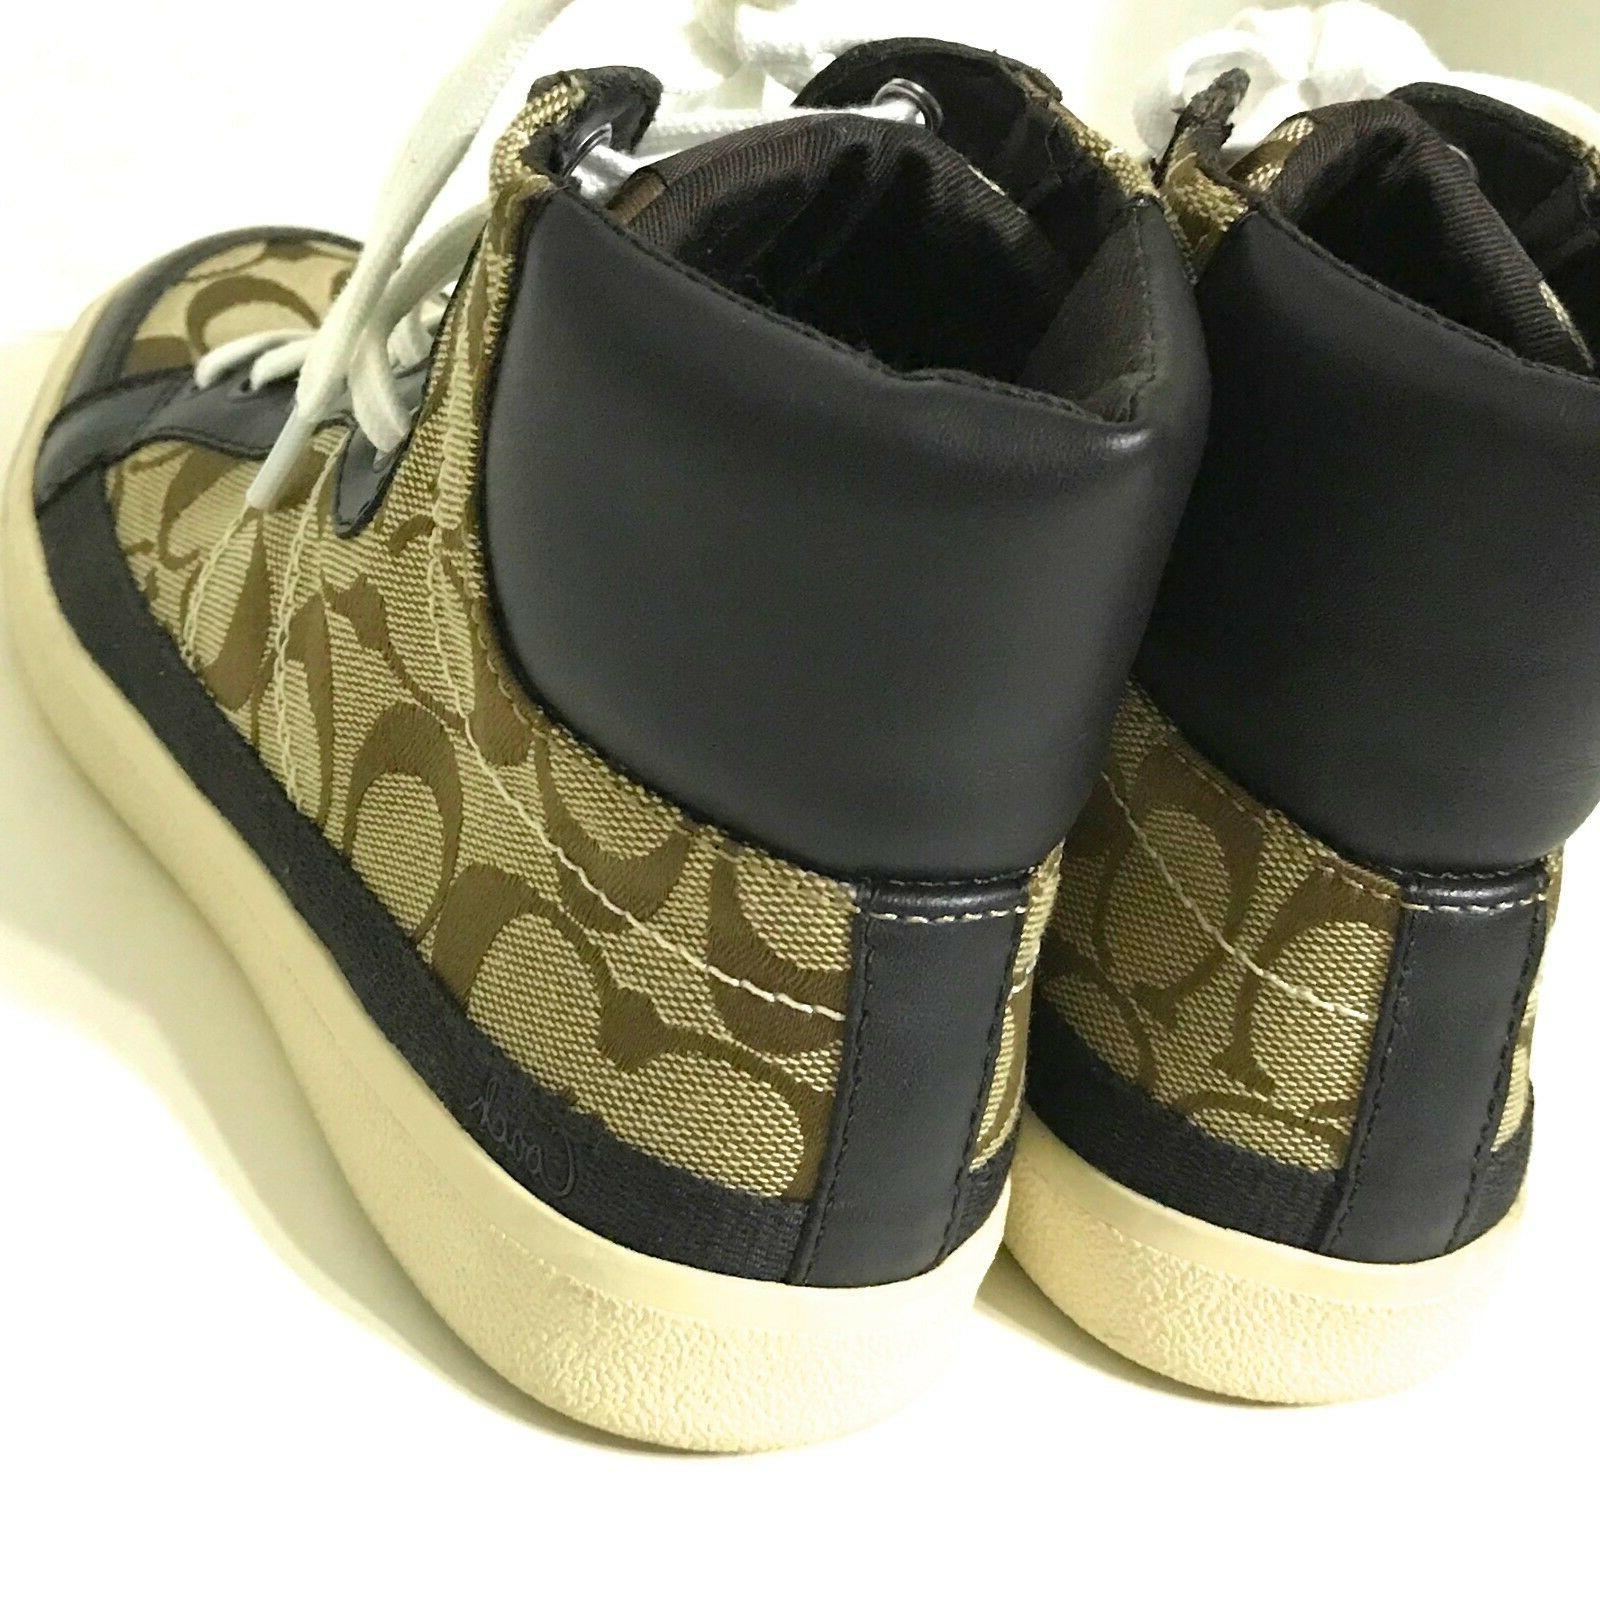 NWOB Coach Tops Shoes Brown/Tan WORN / NEW!!